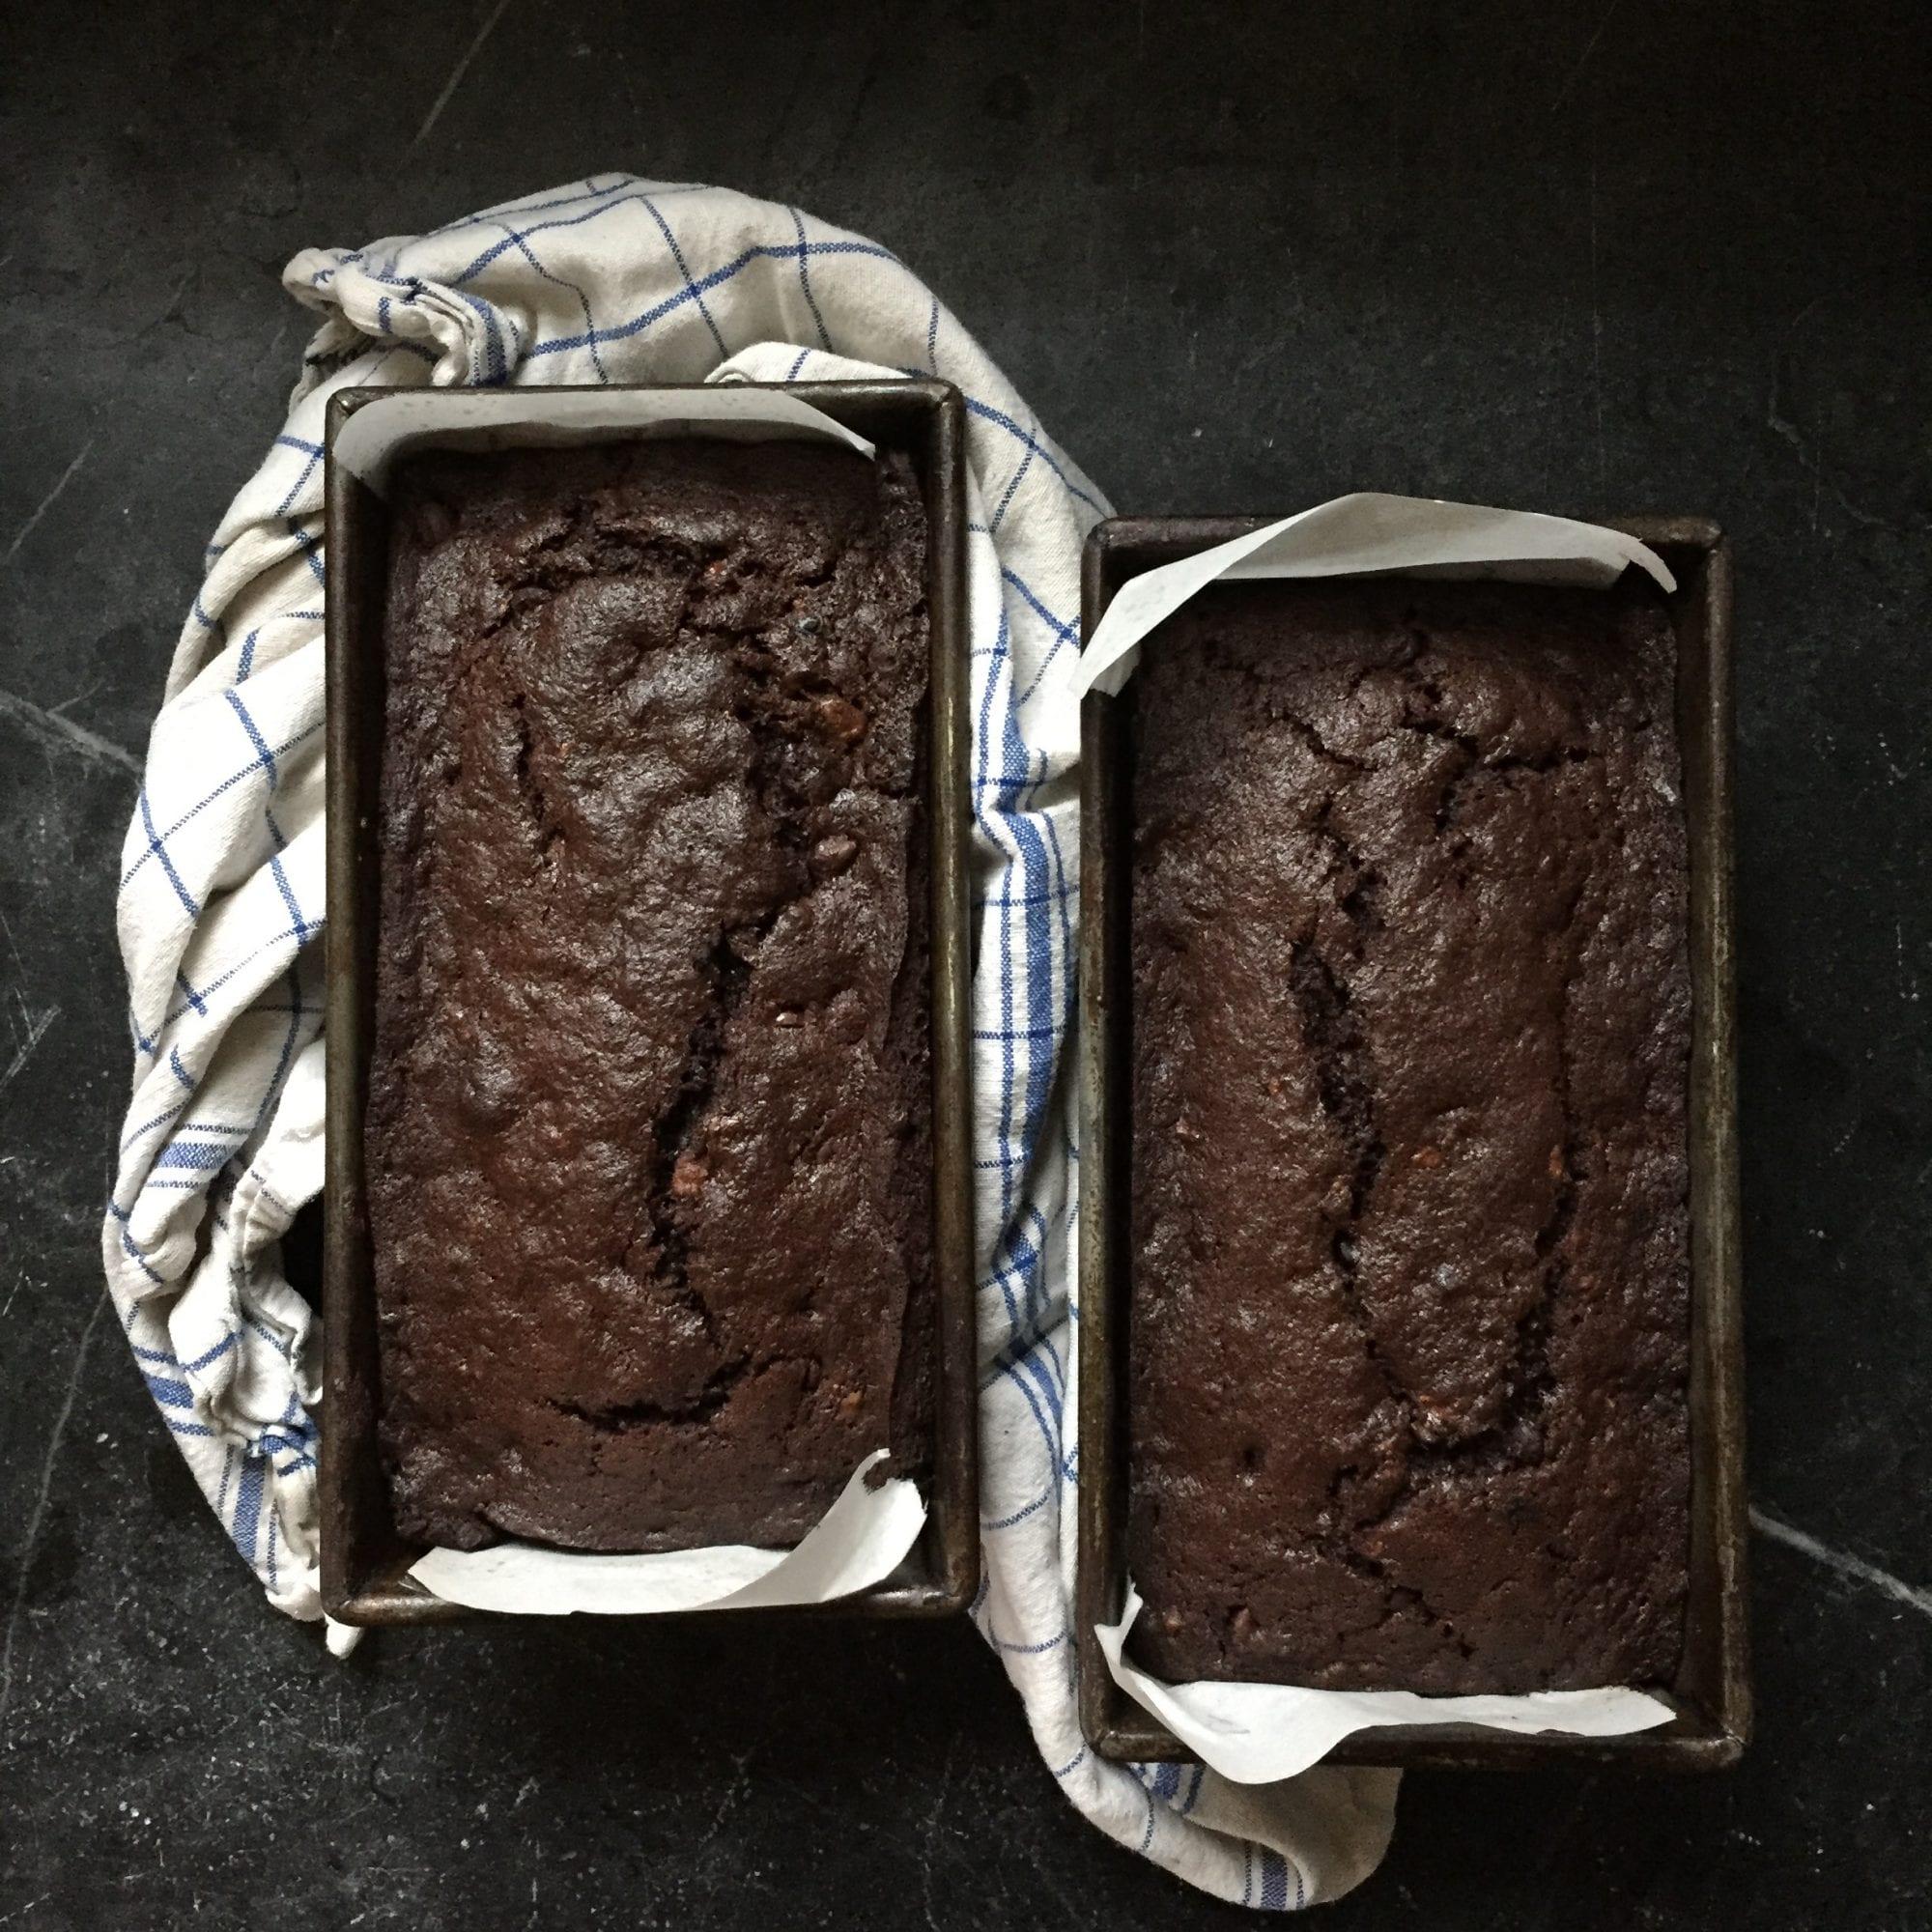 Chocolate Banana Bread Pudding Recipe | Jessie Sheehan Bakes